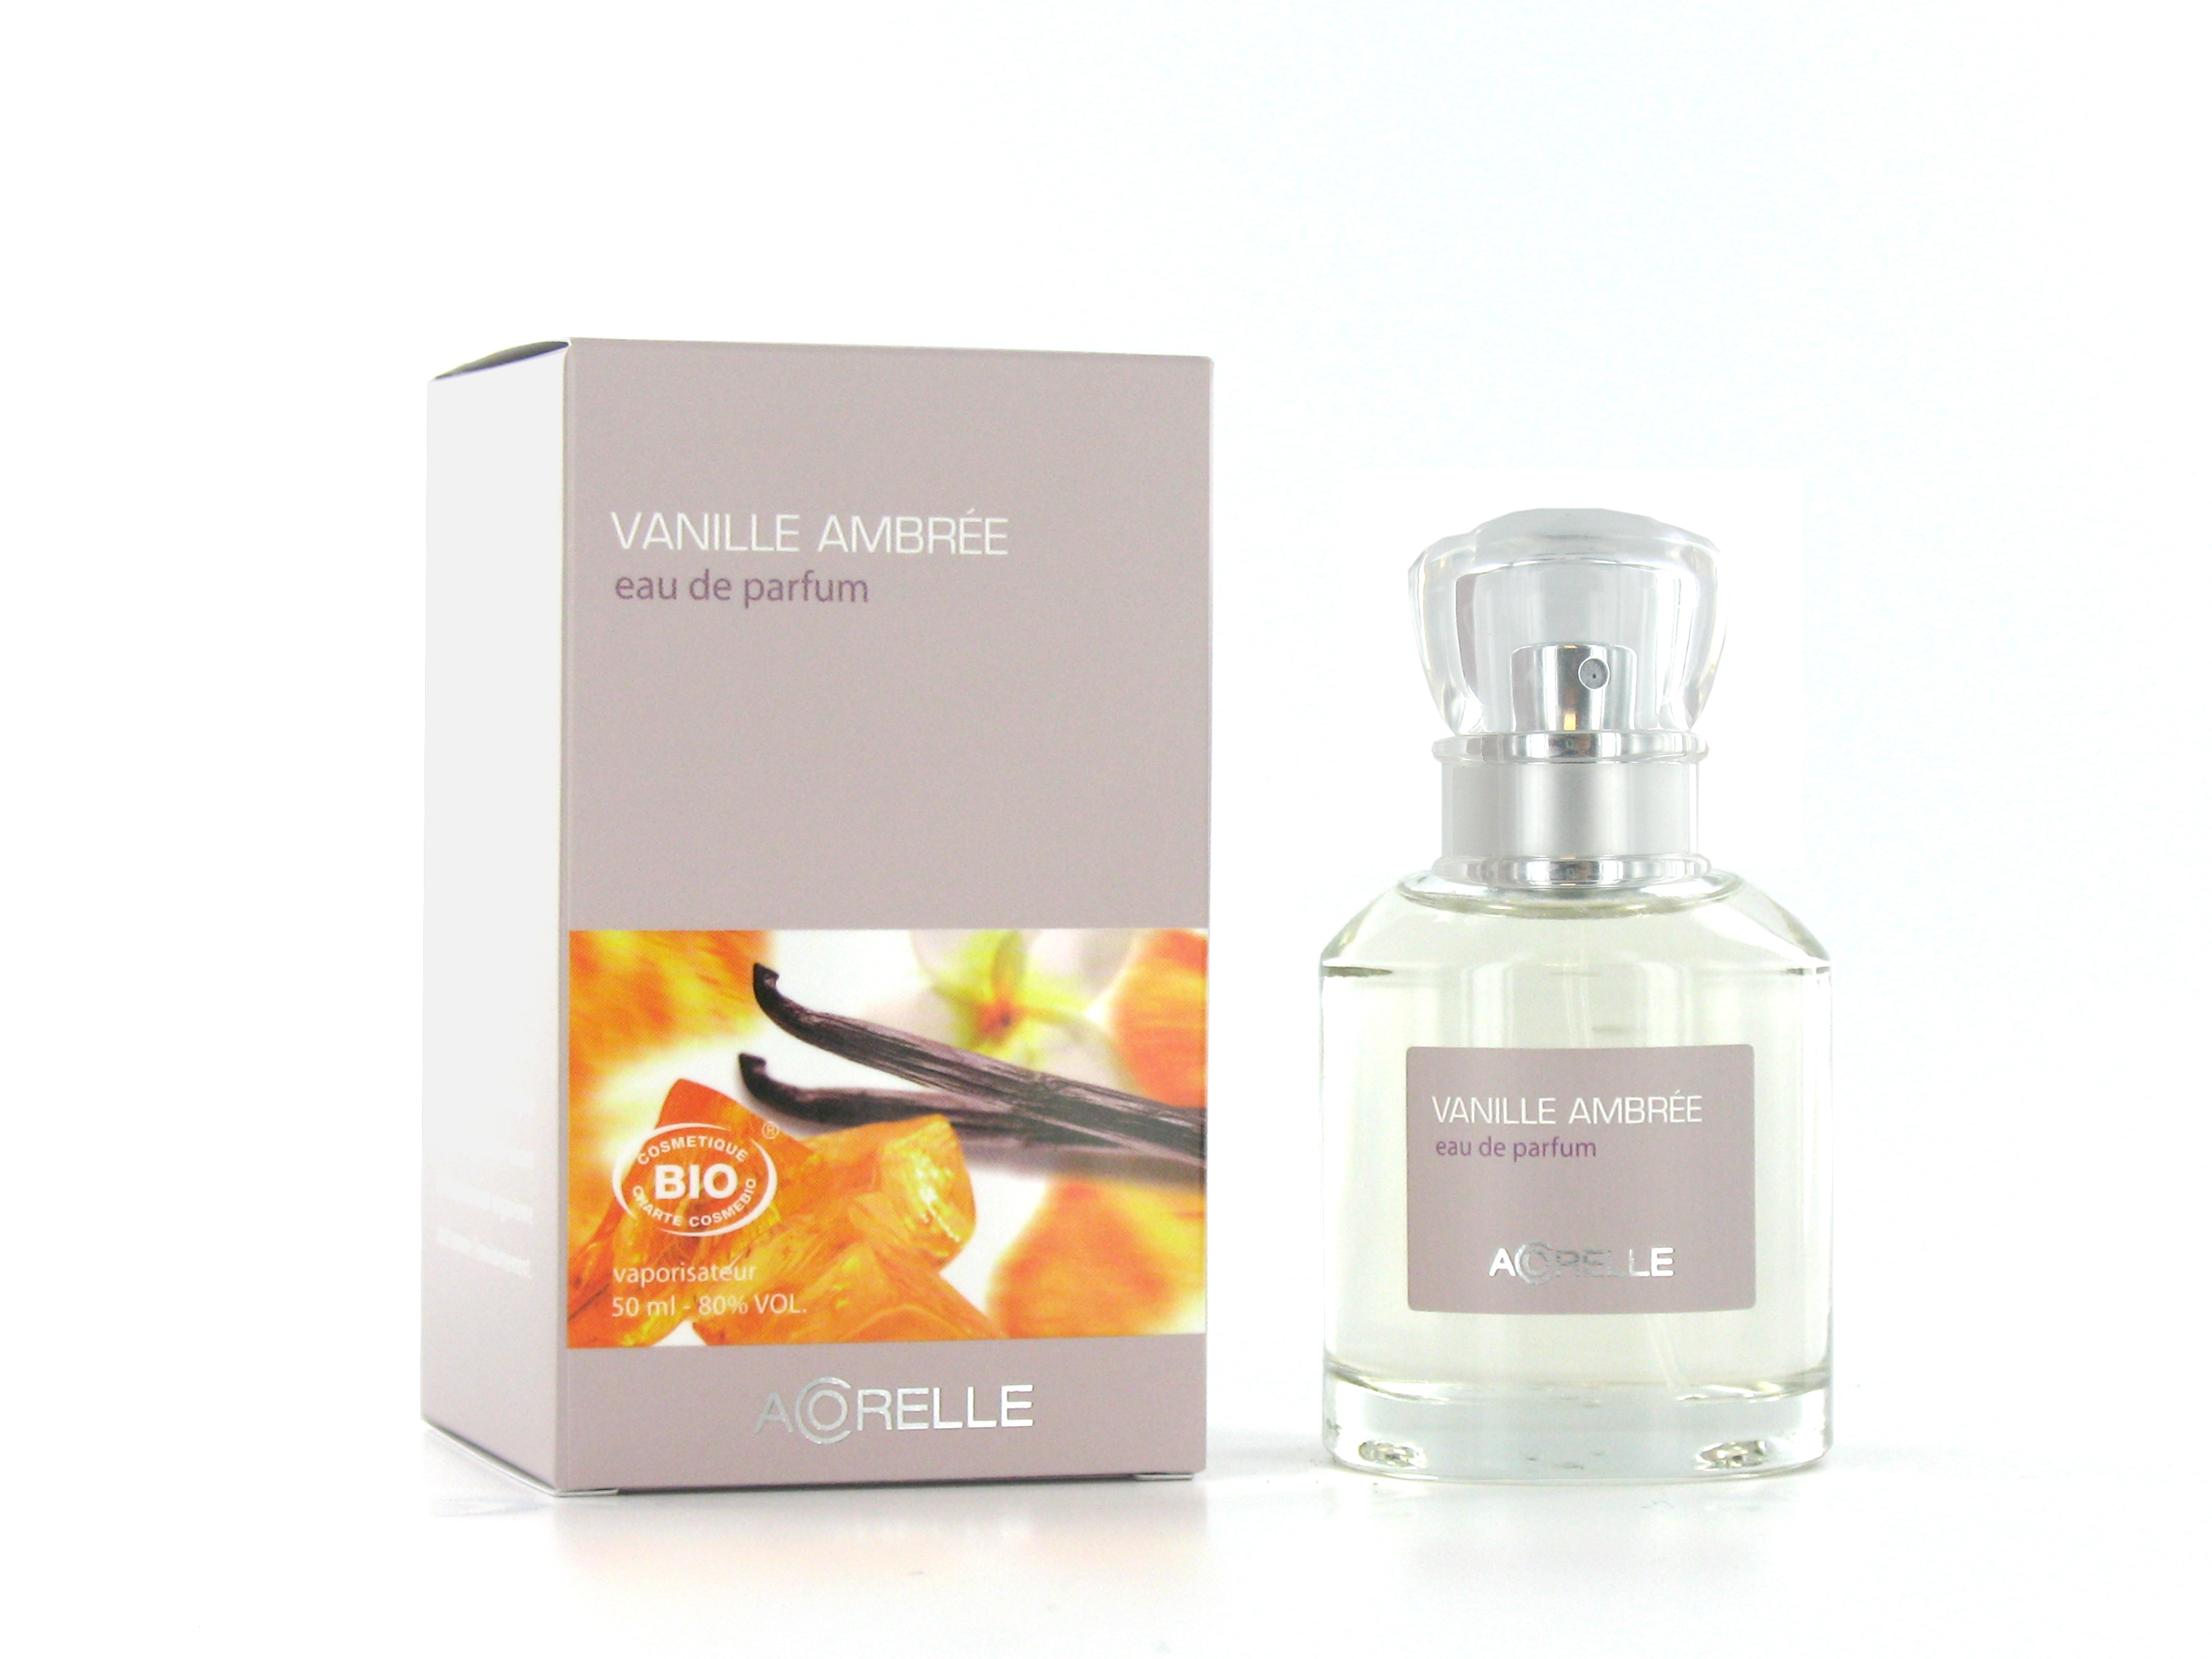 Acorelle Eau de Parfum Amber Vanilla